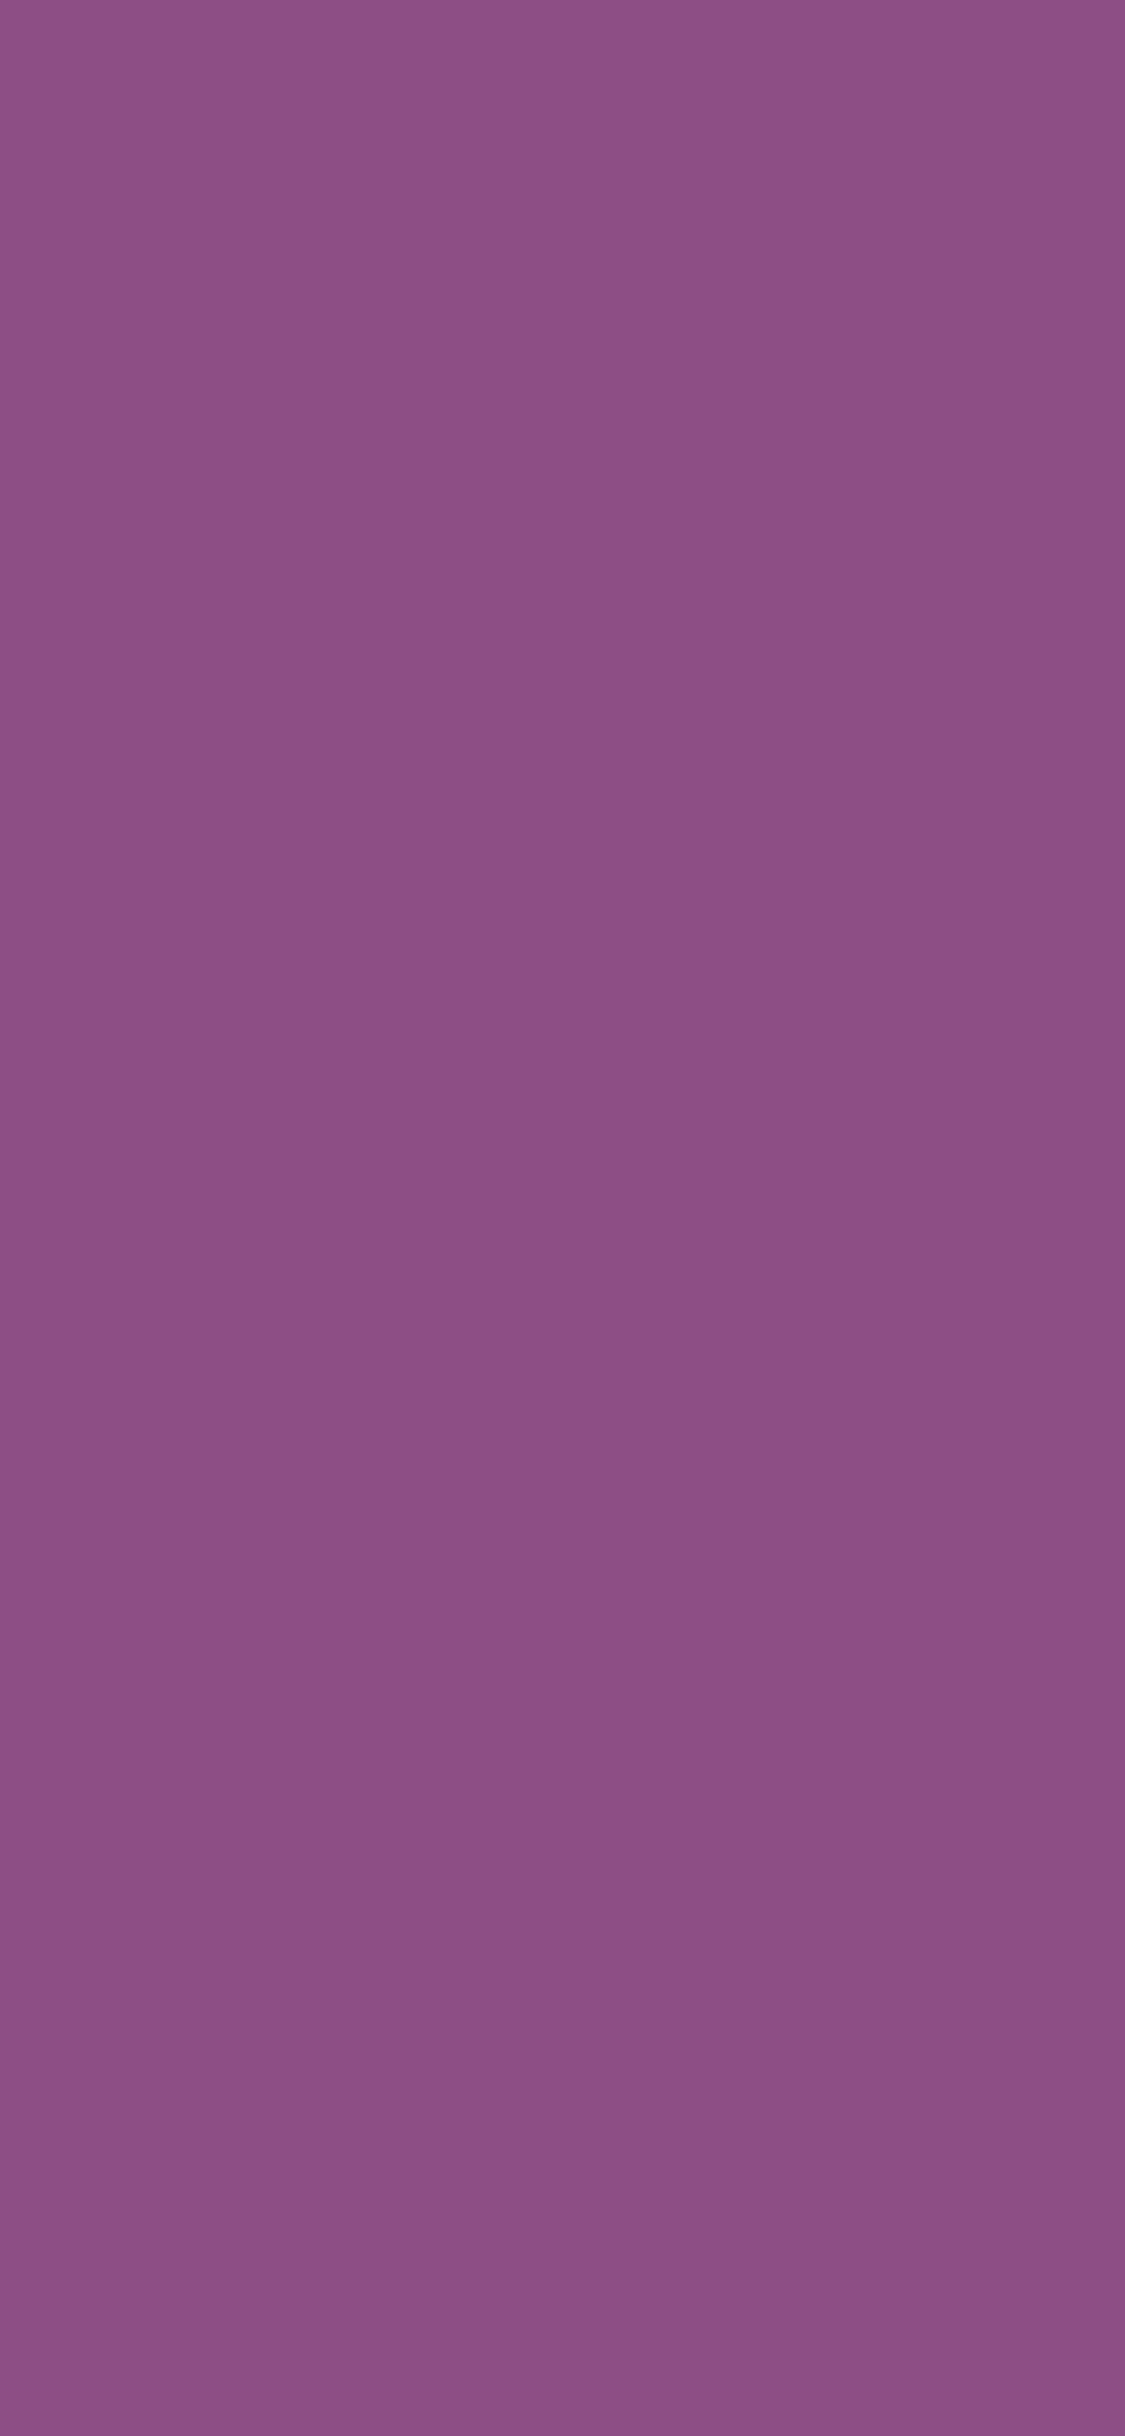 1125x2436 Razzmic Berry Solid Color Background